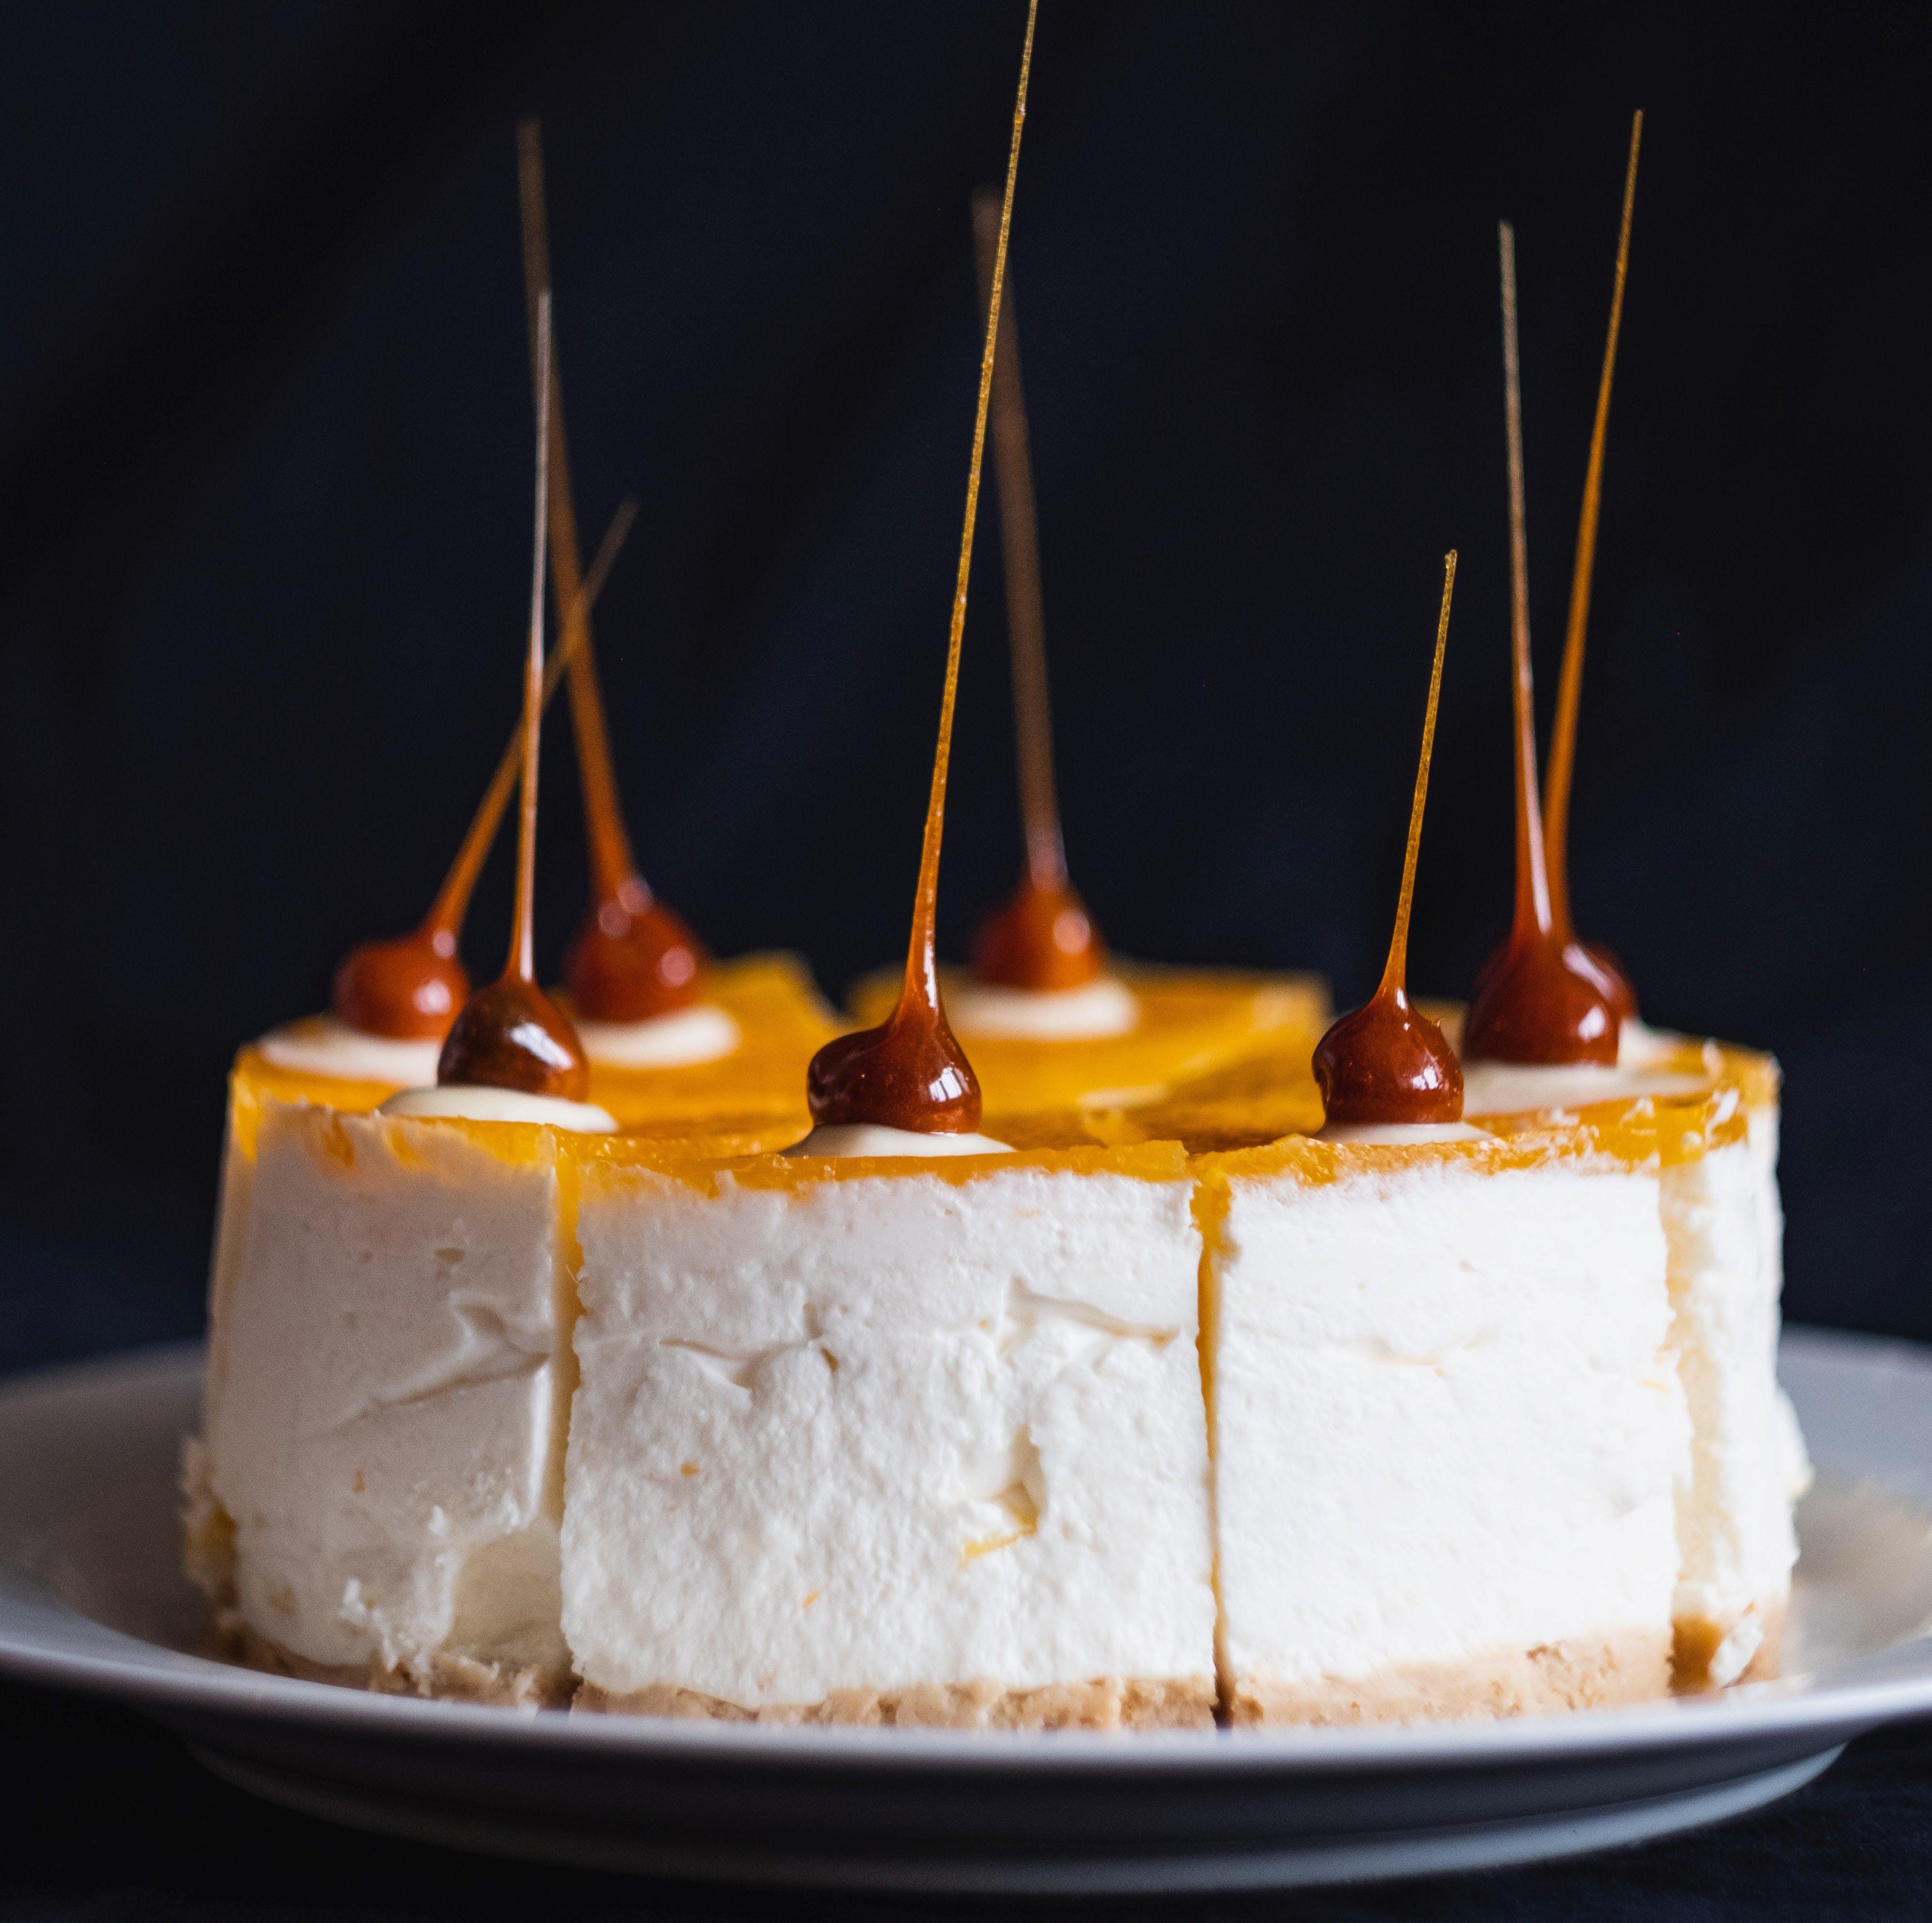 Dish,Food,Cuisine,Tres leches cake,Dessert,Cake,Ingredient,Semifreddo,Cheesecake,Baked goods